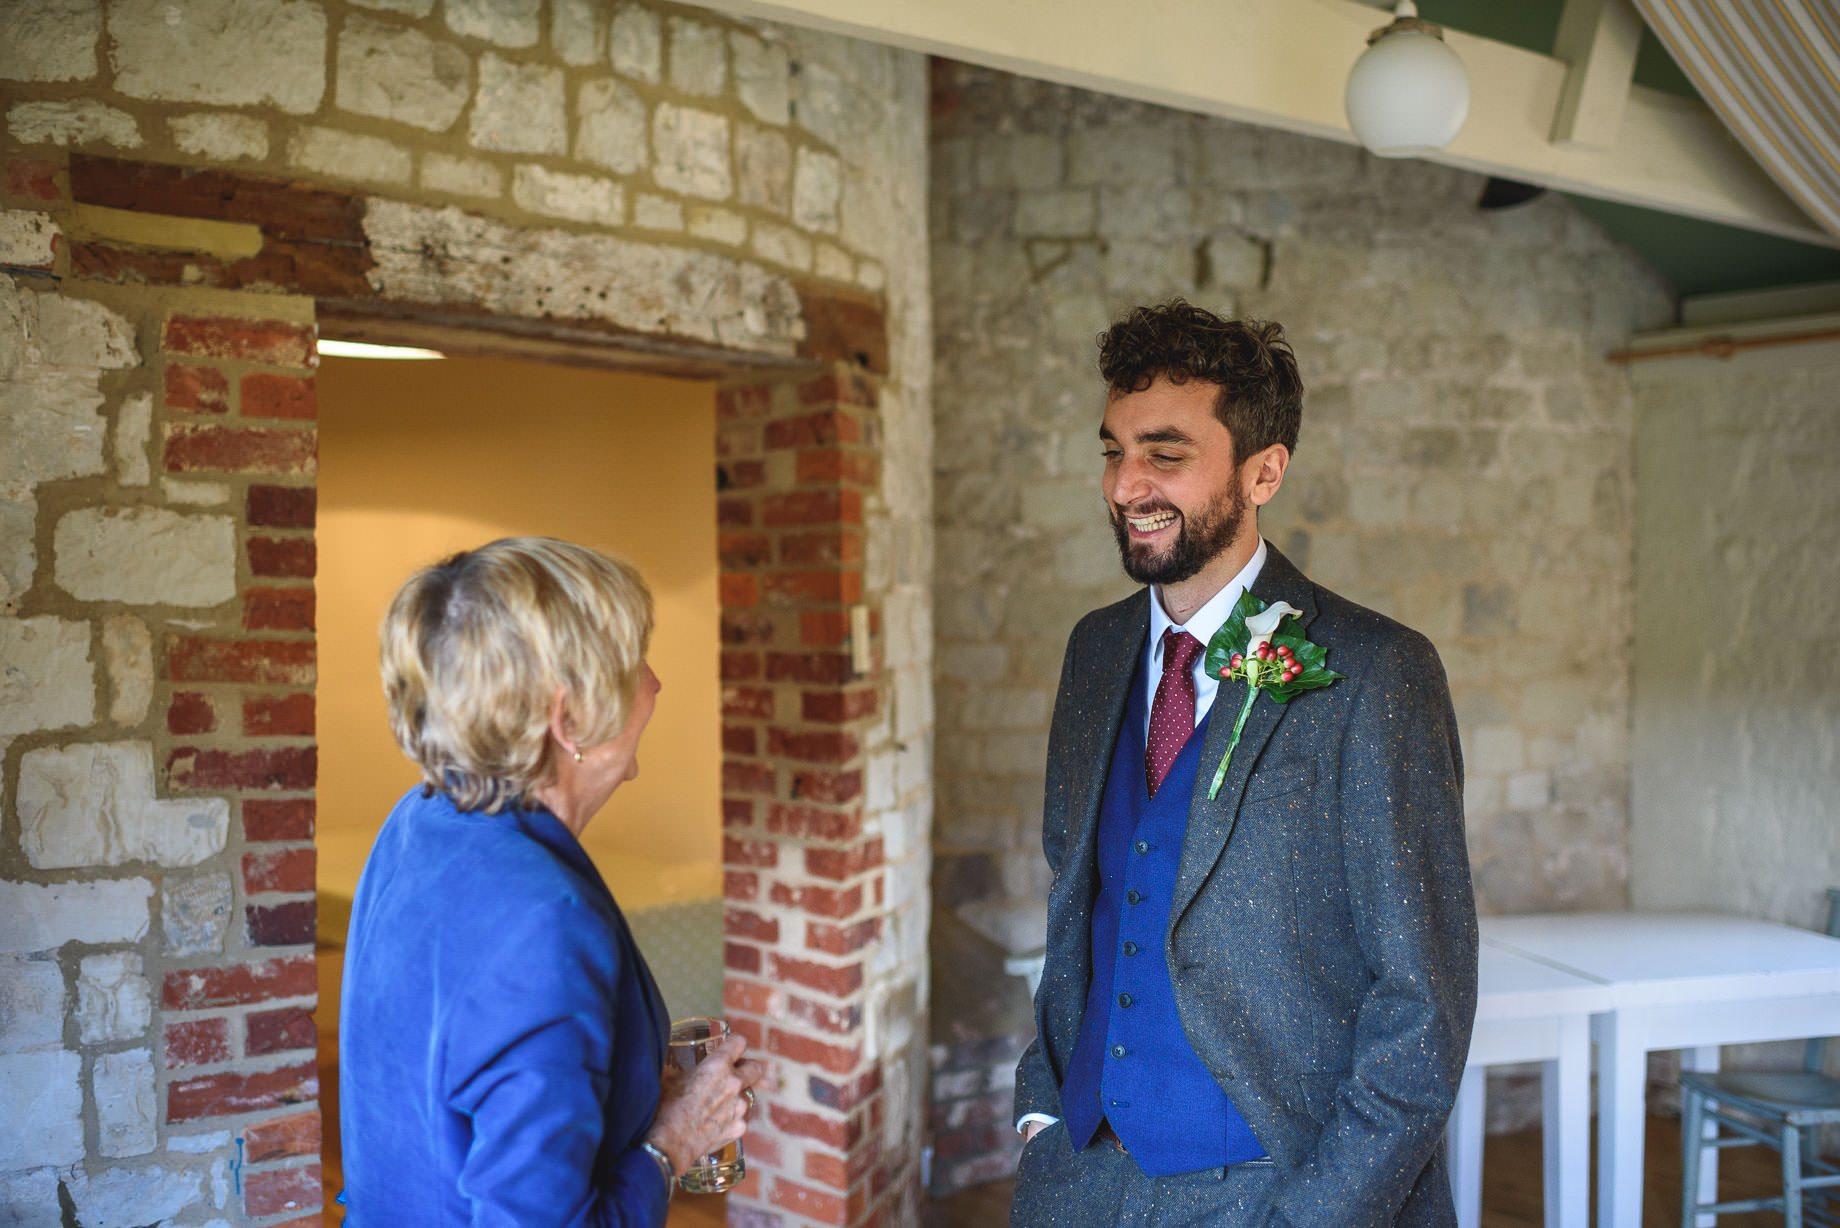 bury-court-barn-wedding-photography-guy-collier-photography-nadia-tom-25-of-184